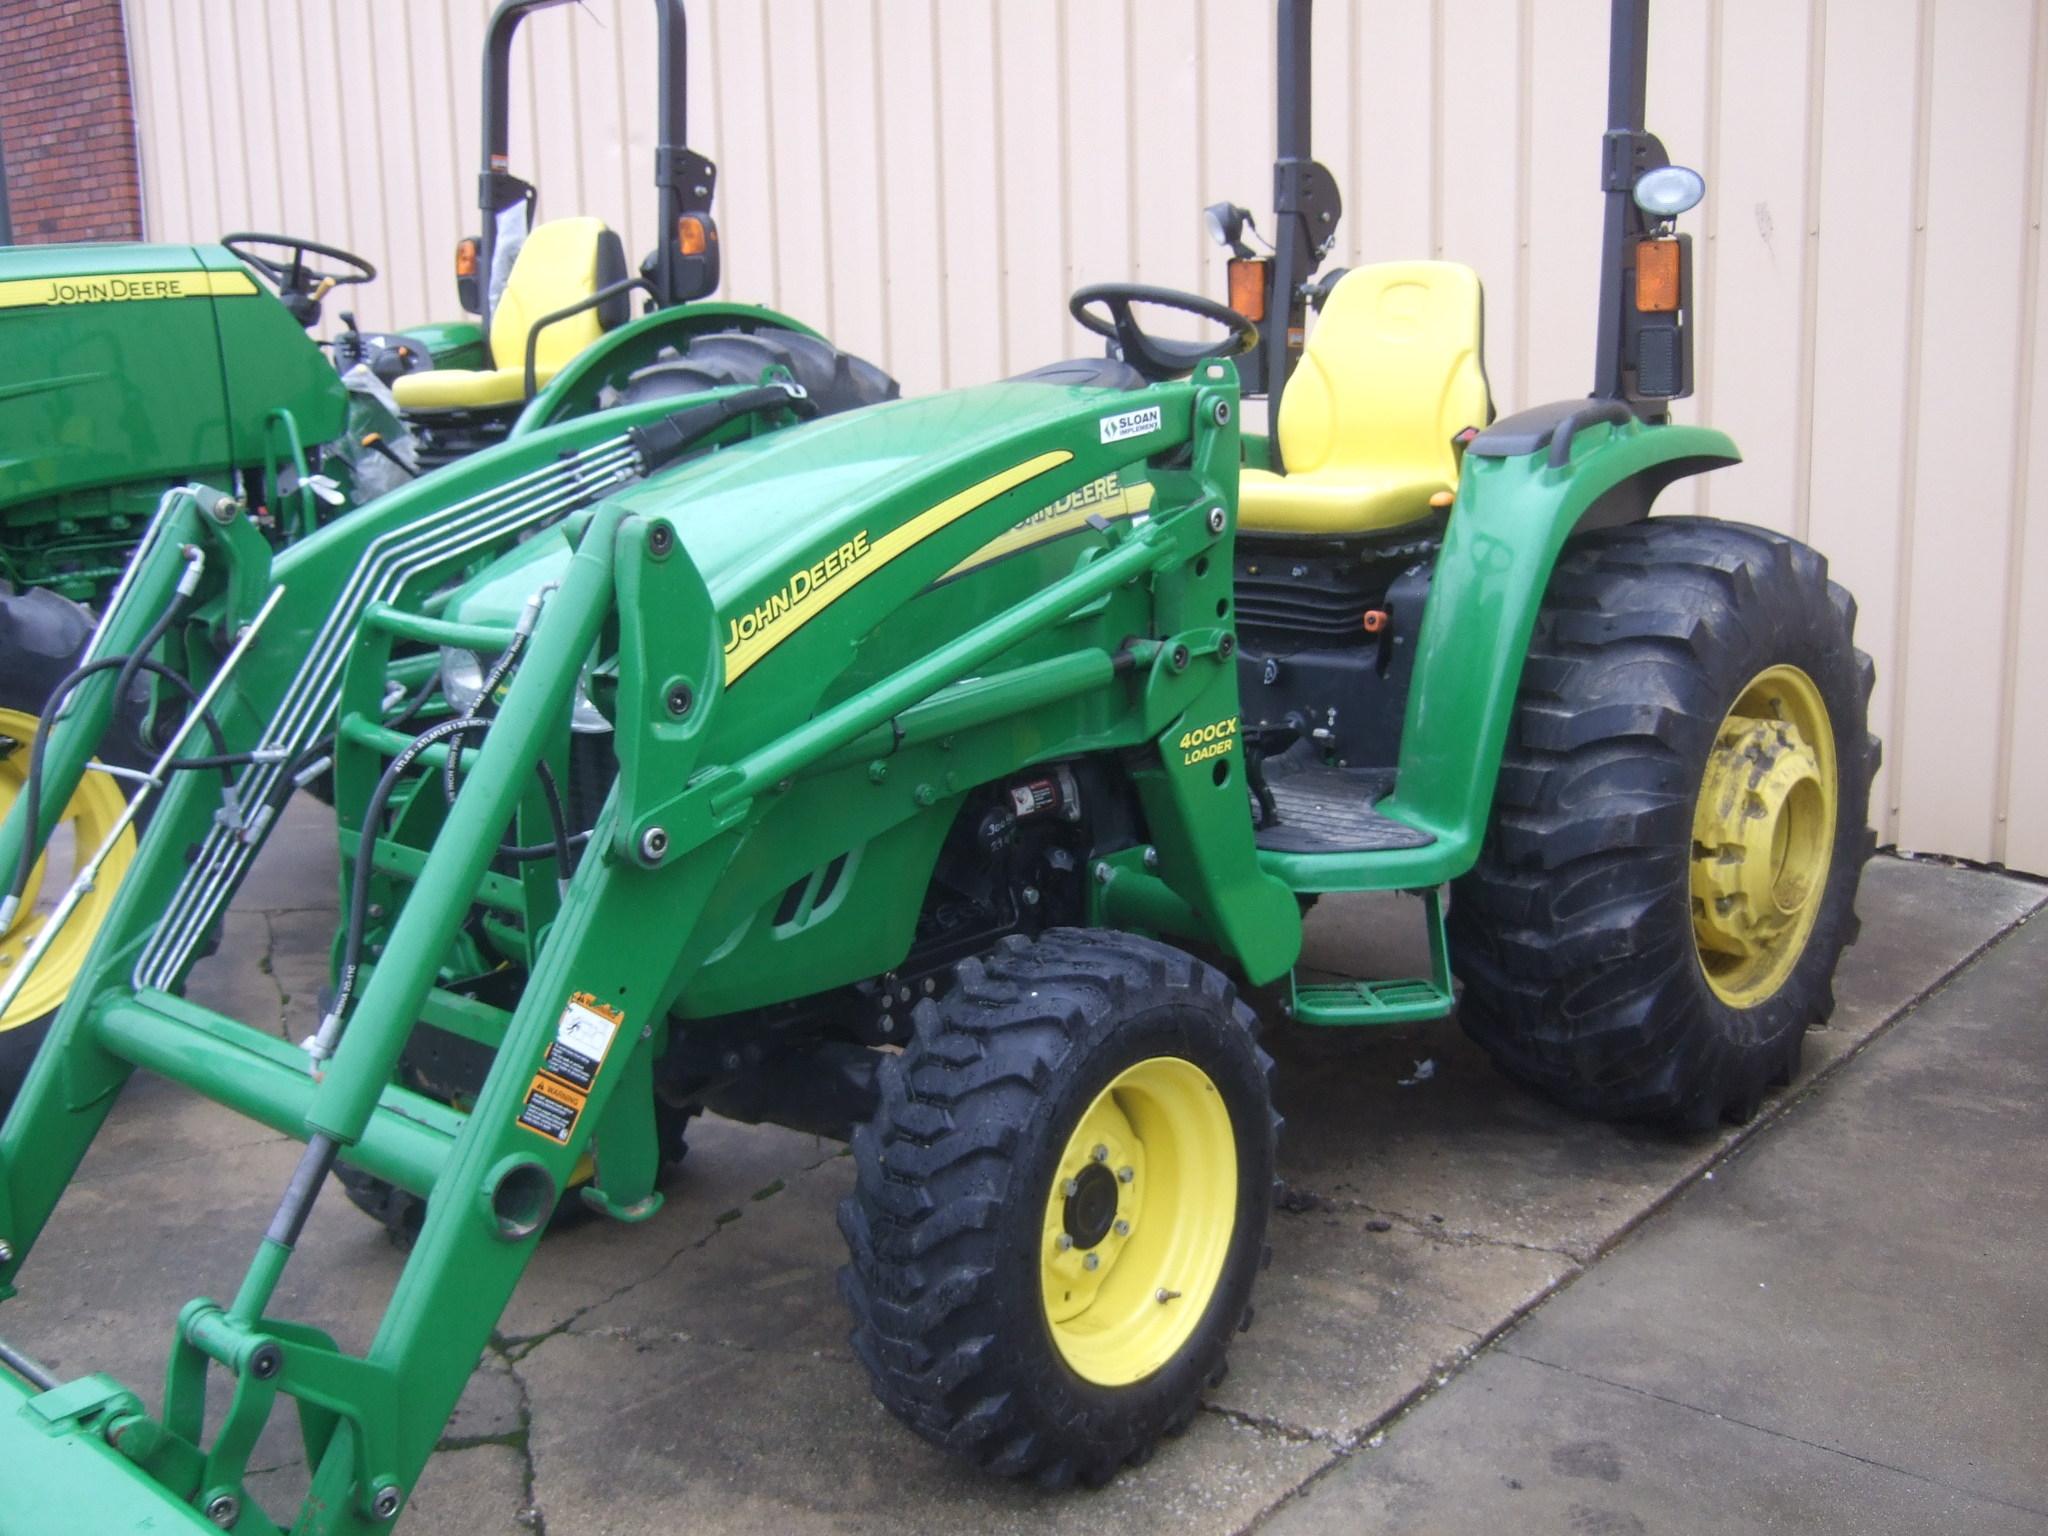 John Deere 4720 Compact Utility Tractors for Sale   [35389]